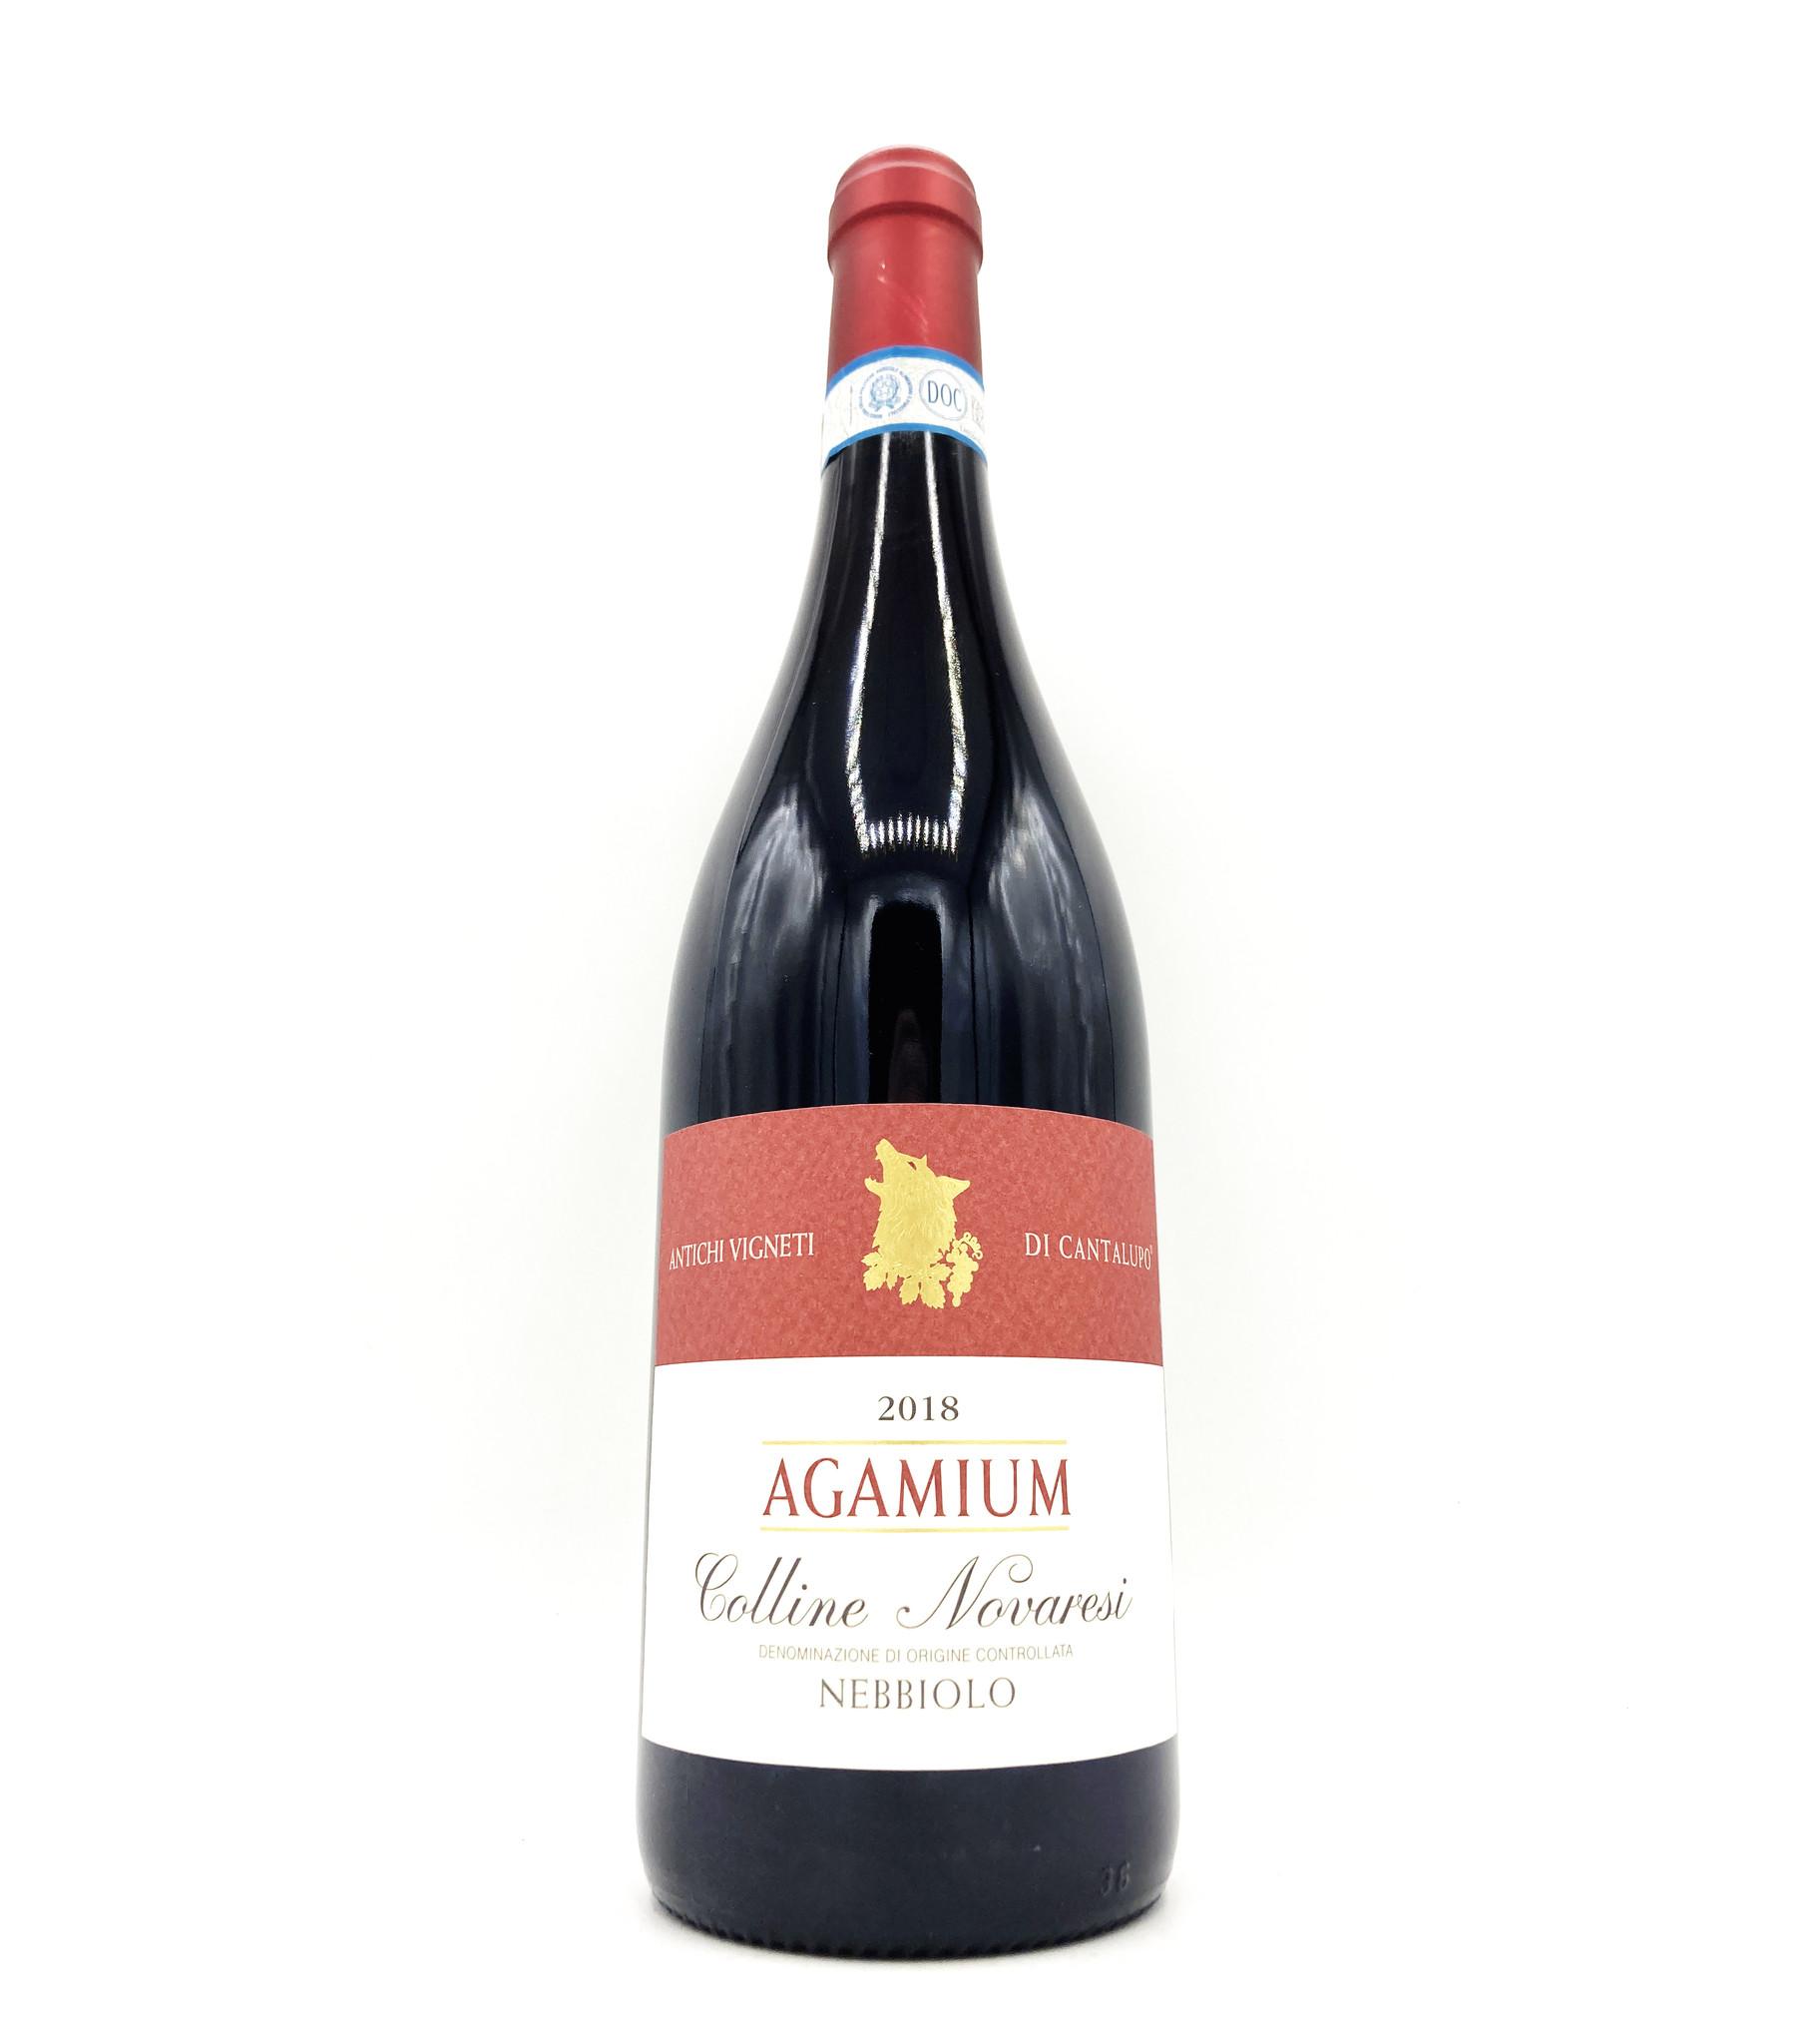 Nebbiolo Agamium 2018 Cantalupo